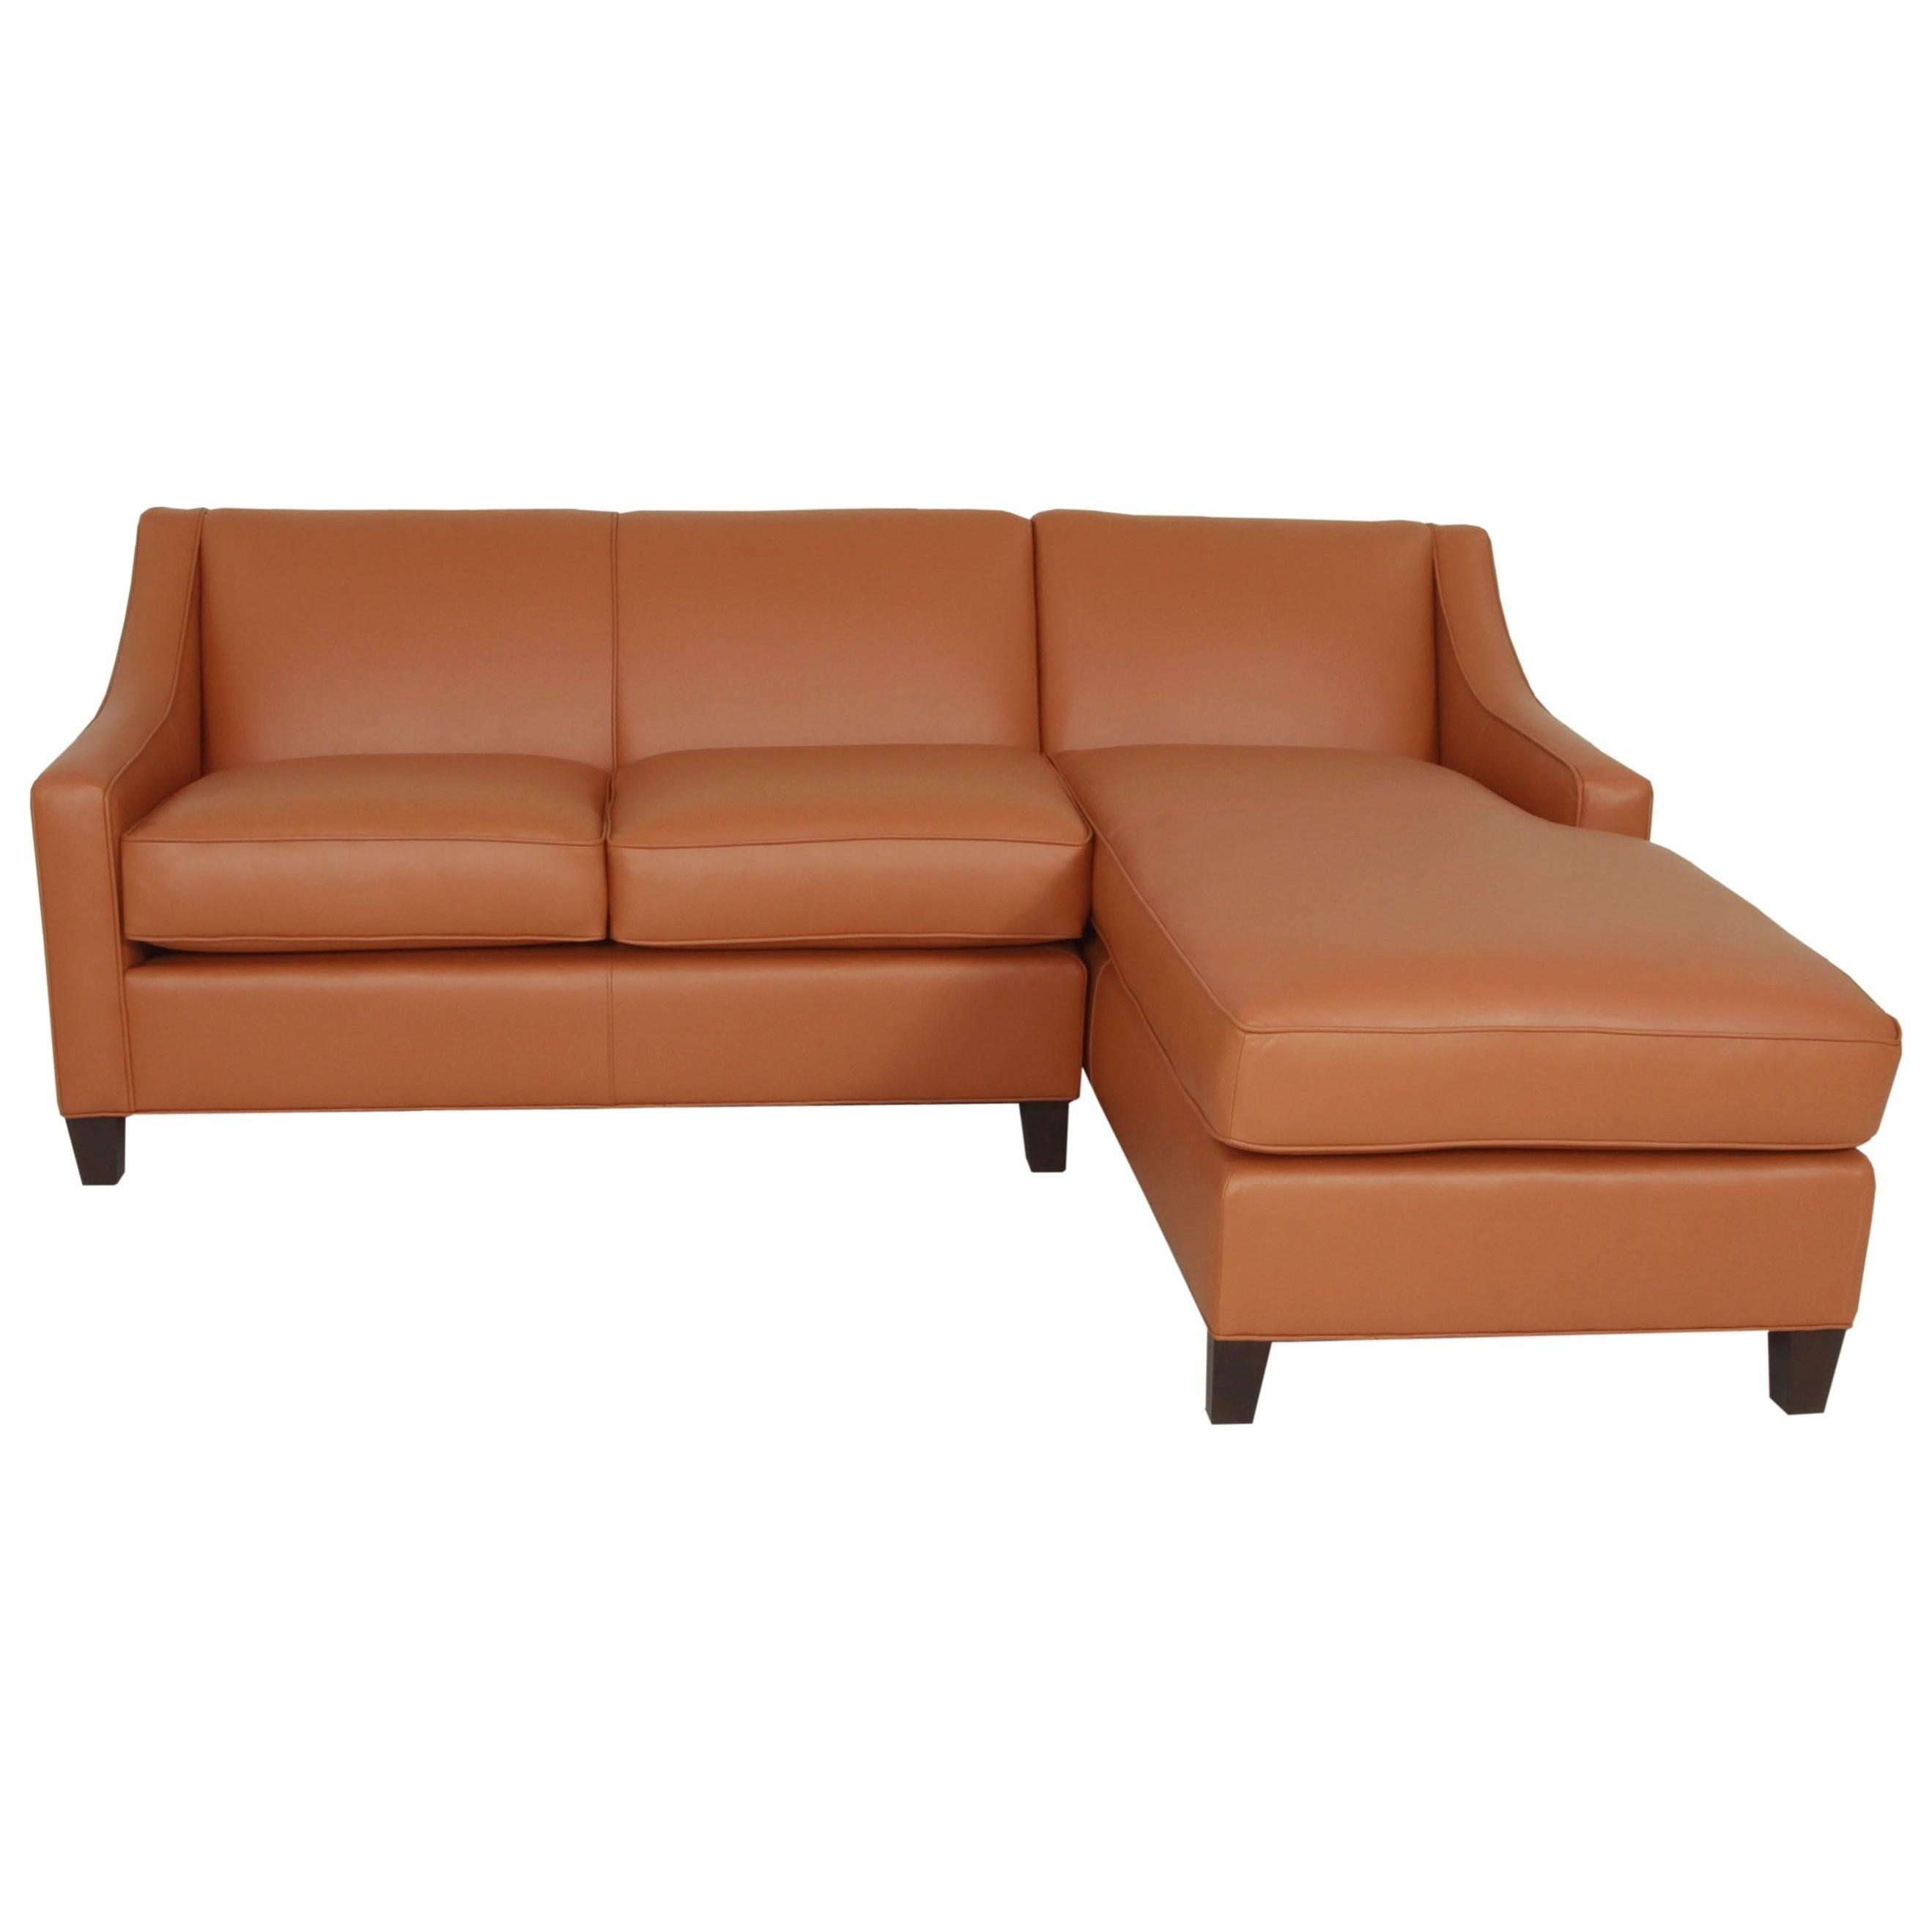 Blake Sofa Chaise by Norwalk at Saugerties Furniture Mart